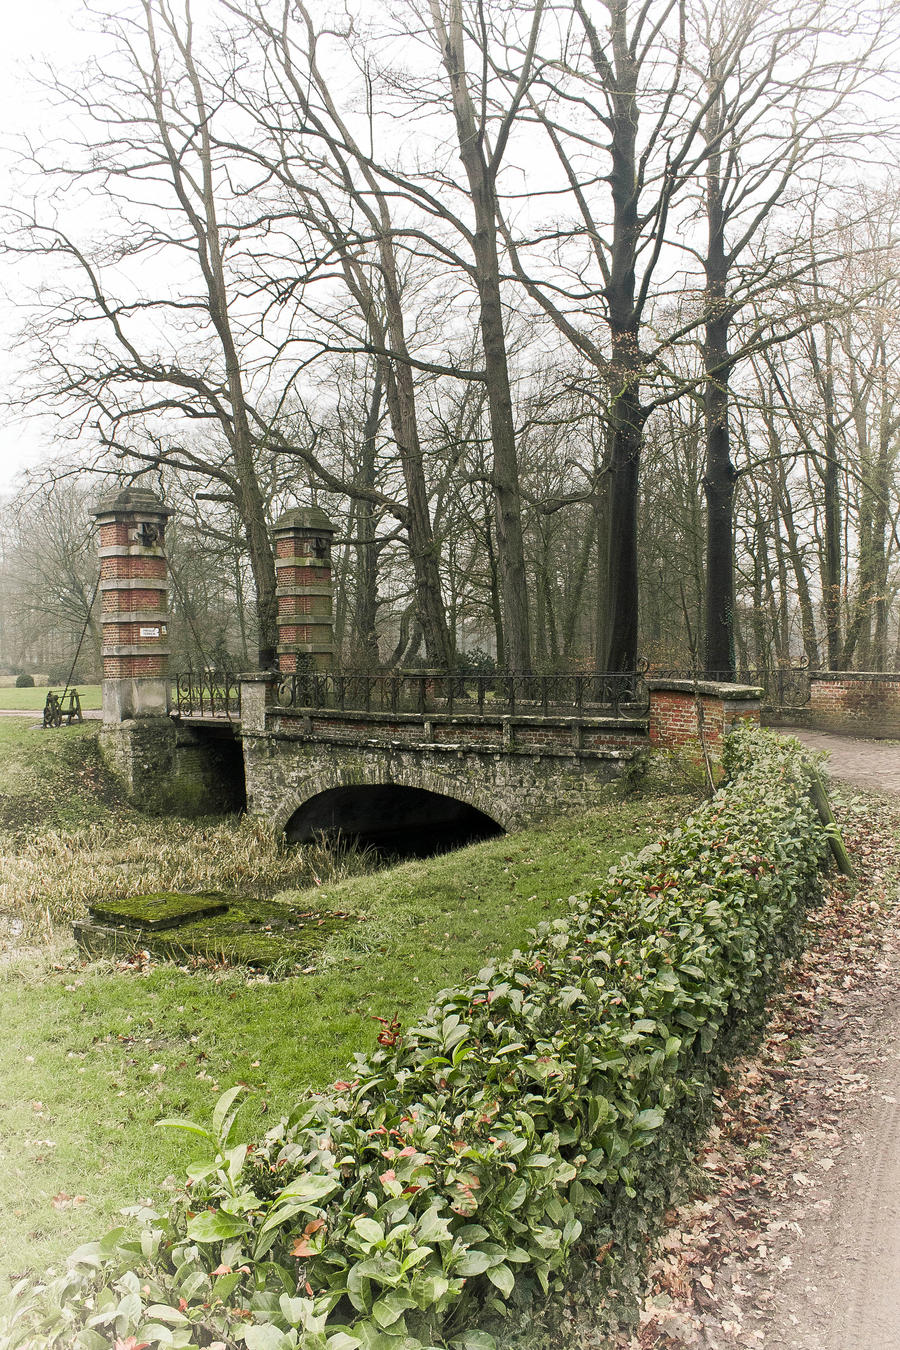 Bridge by the-awaken